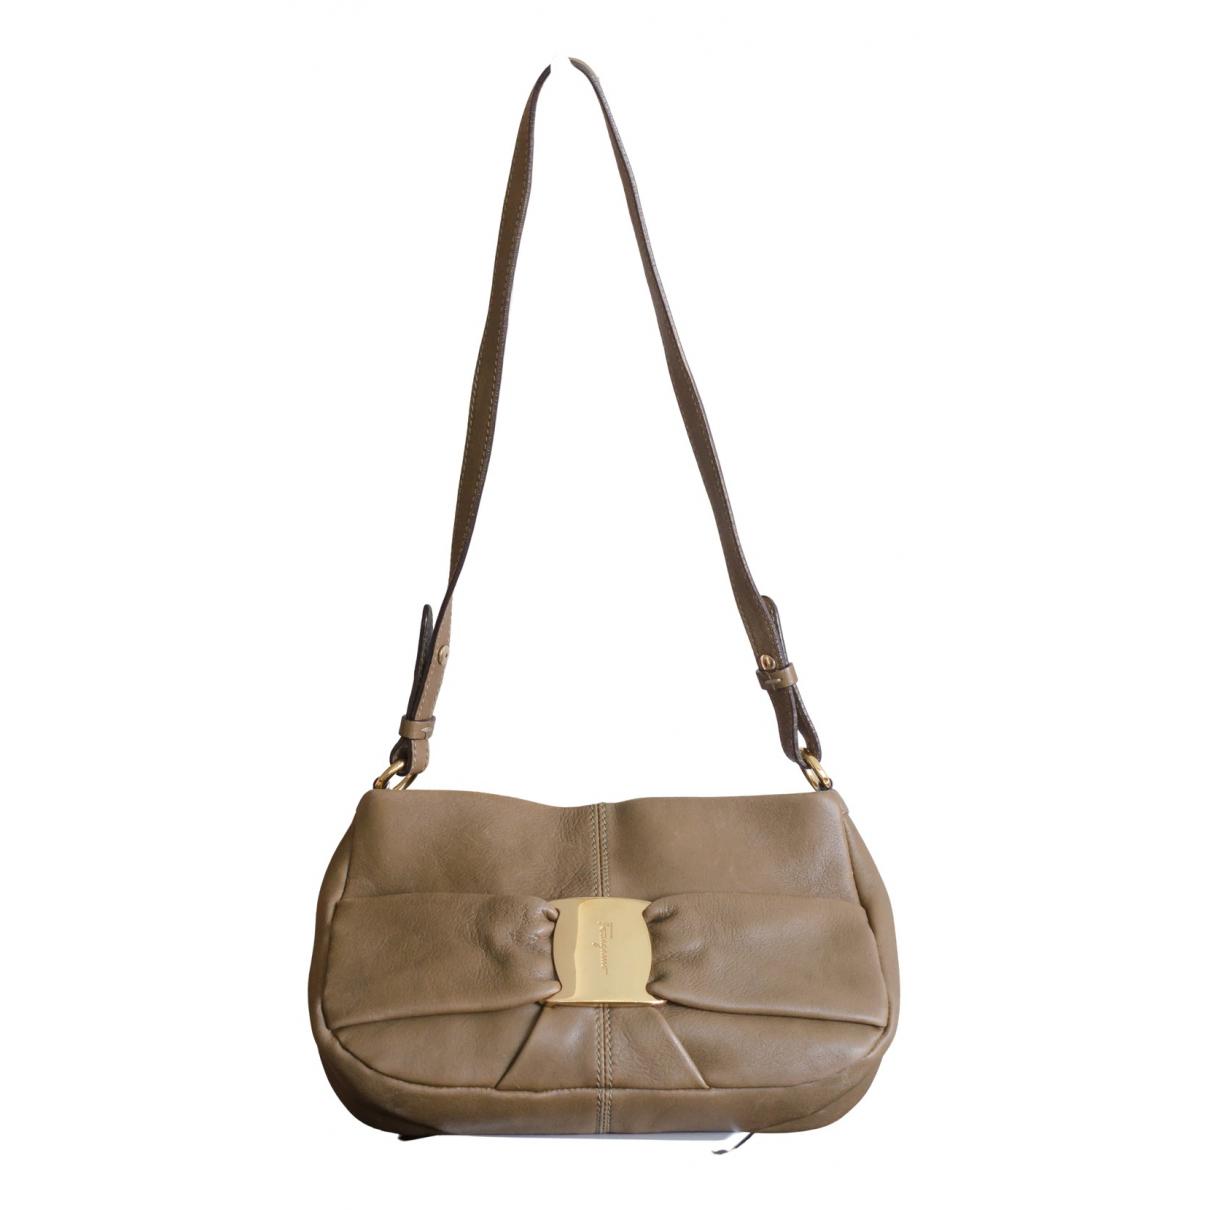 Salvatore Ferragamo Vara Brown Leather handbag for Women N